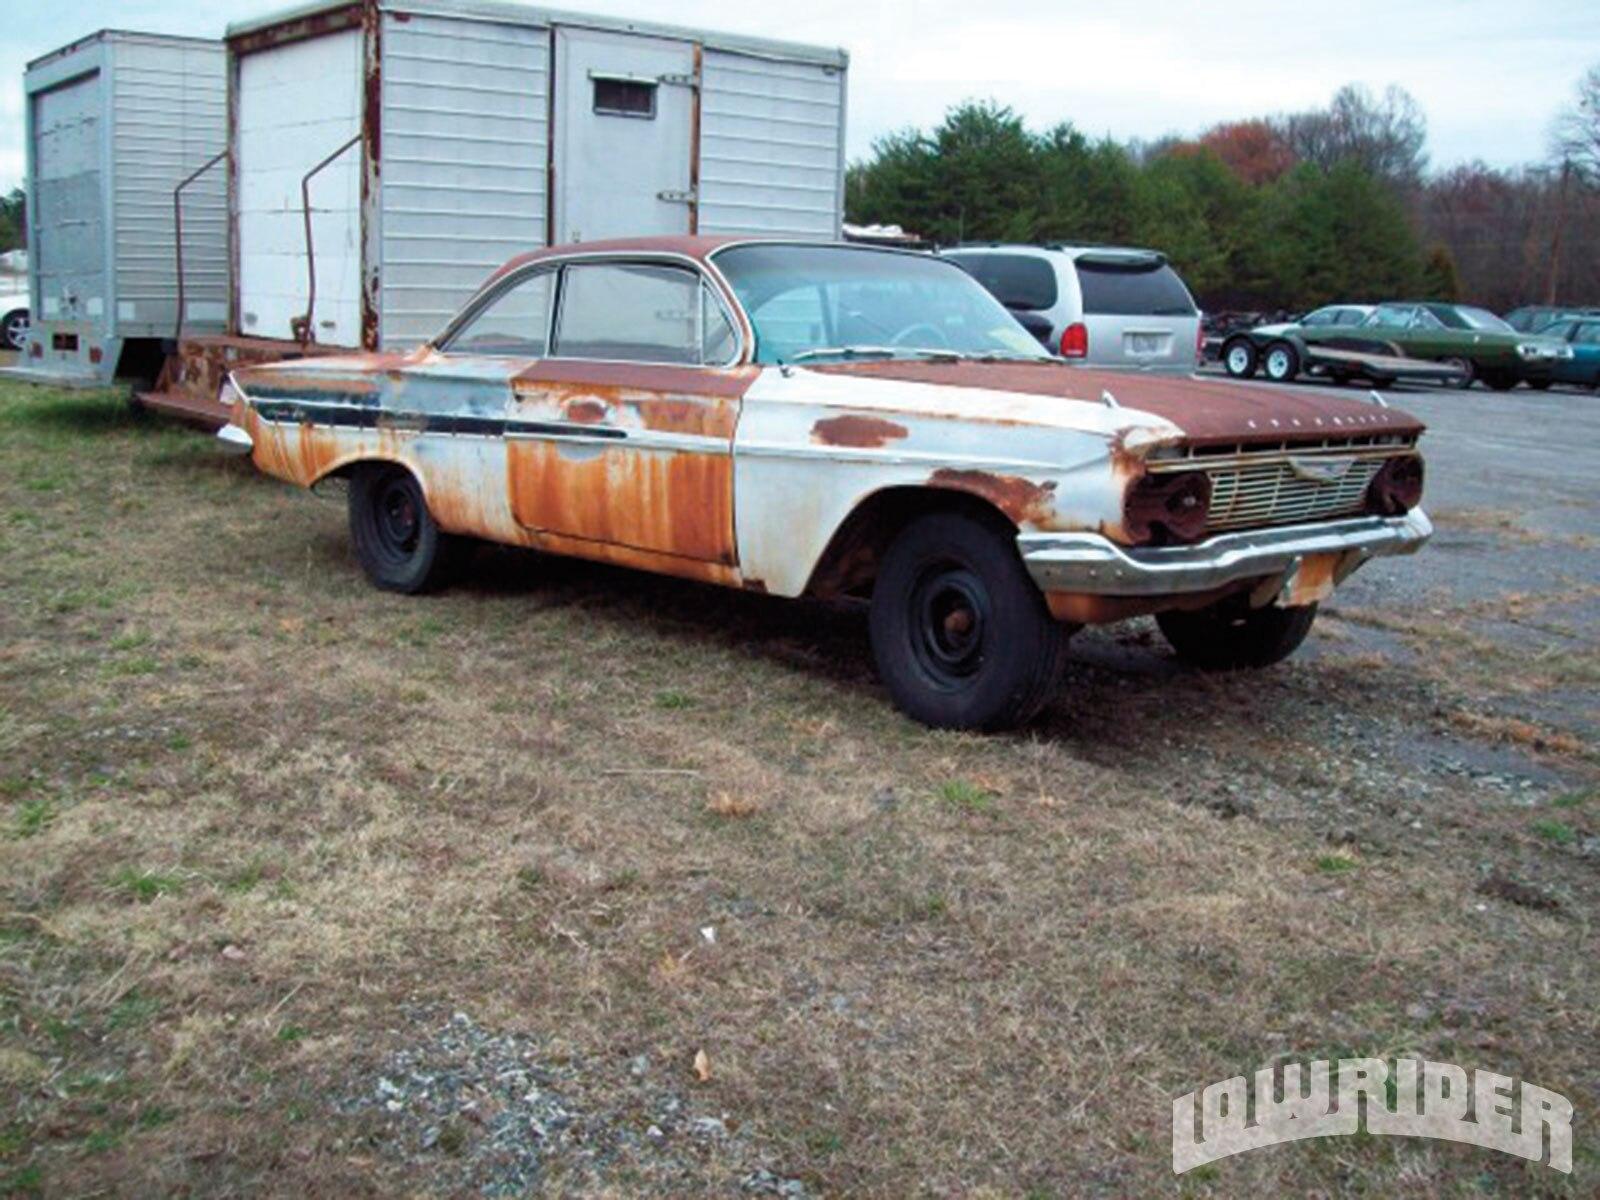 1303-lrmp-01-o-registering-a-car-with-VIP-1961-chevy-impala